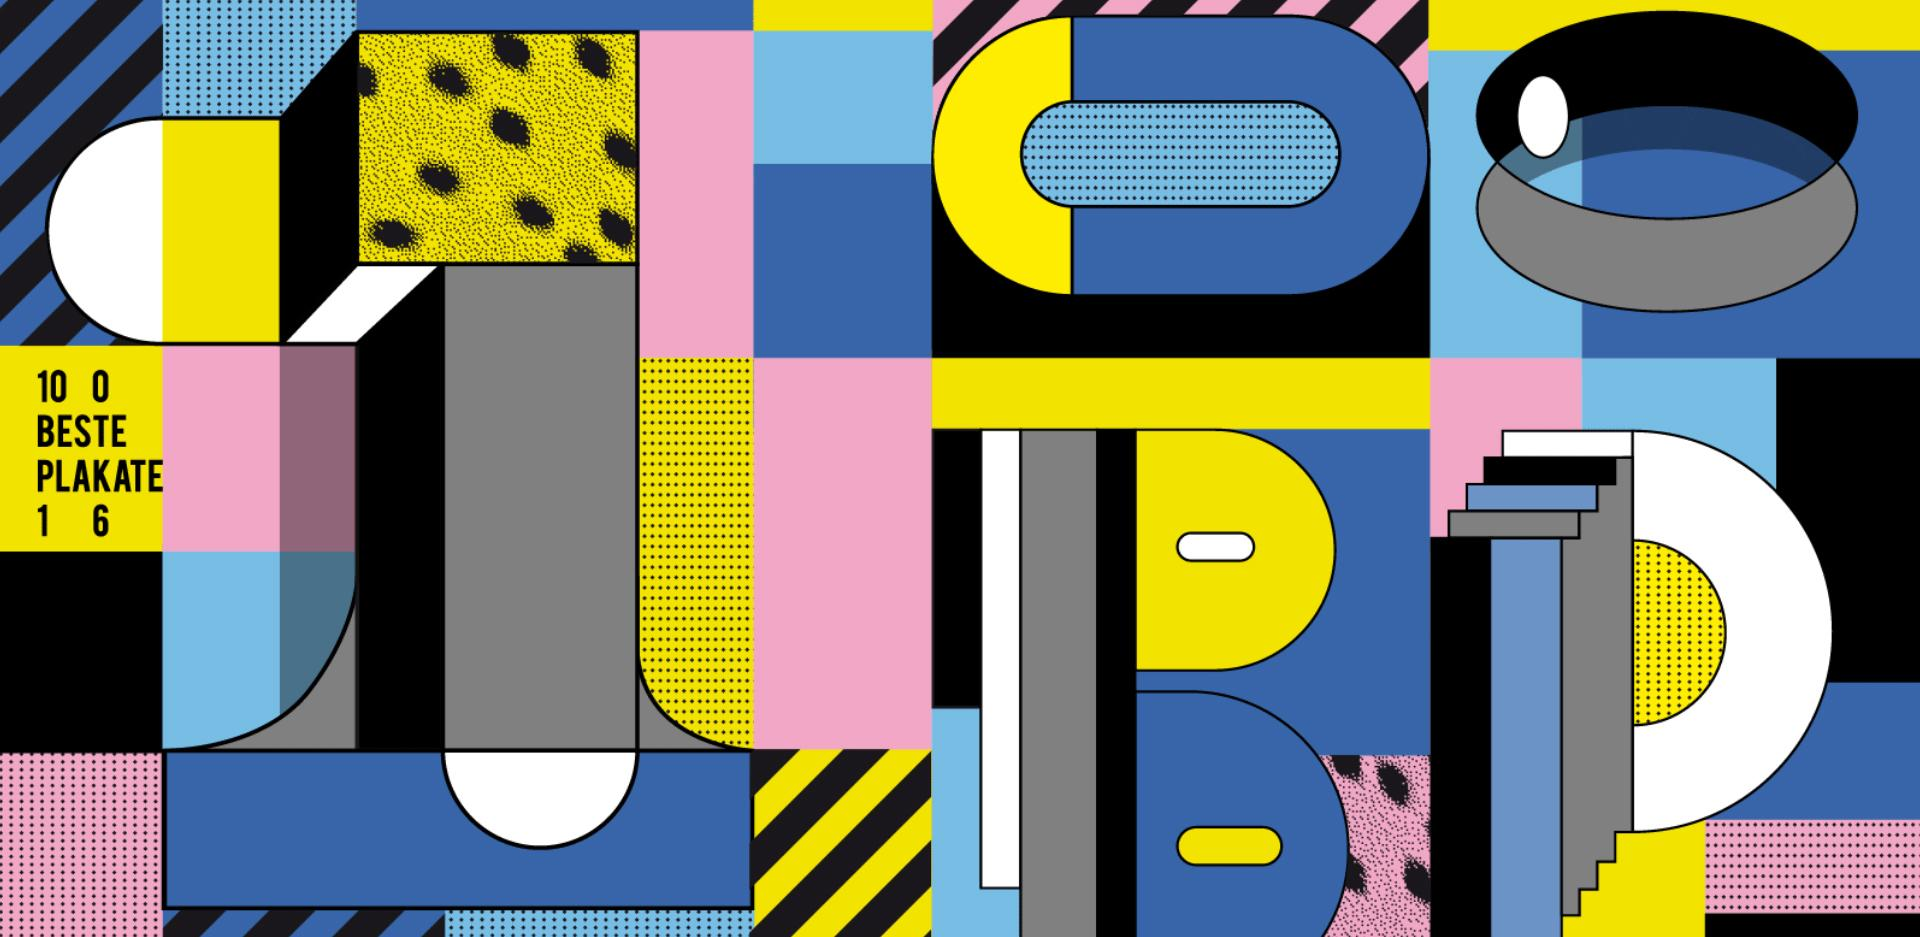 100 best posters 16 germany austria switzerland verein 100 beste plakate e v. Black Bedroom Furniture Sets. Home Design Ideas